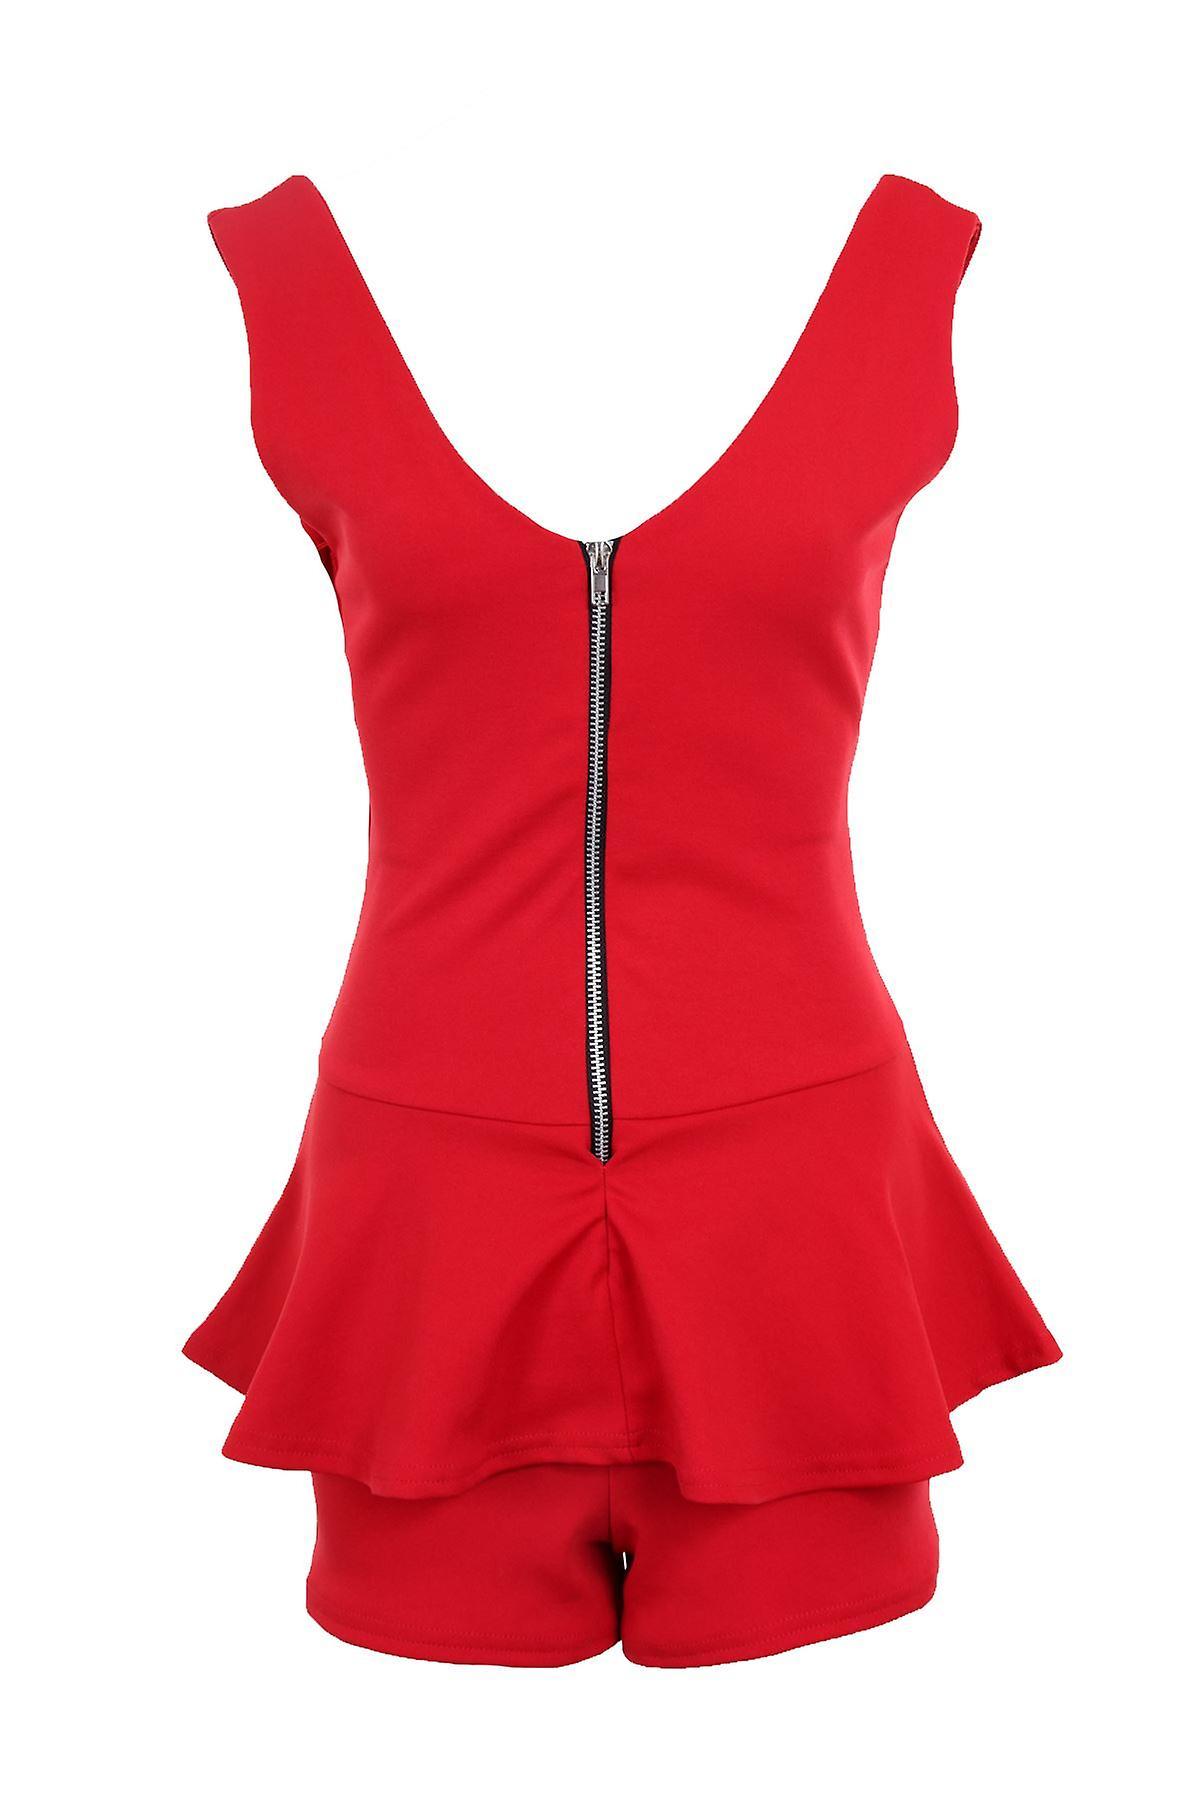 Ladies Sleeveless Zip V Front Back Peplum Short Women's Smart Playsuit